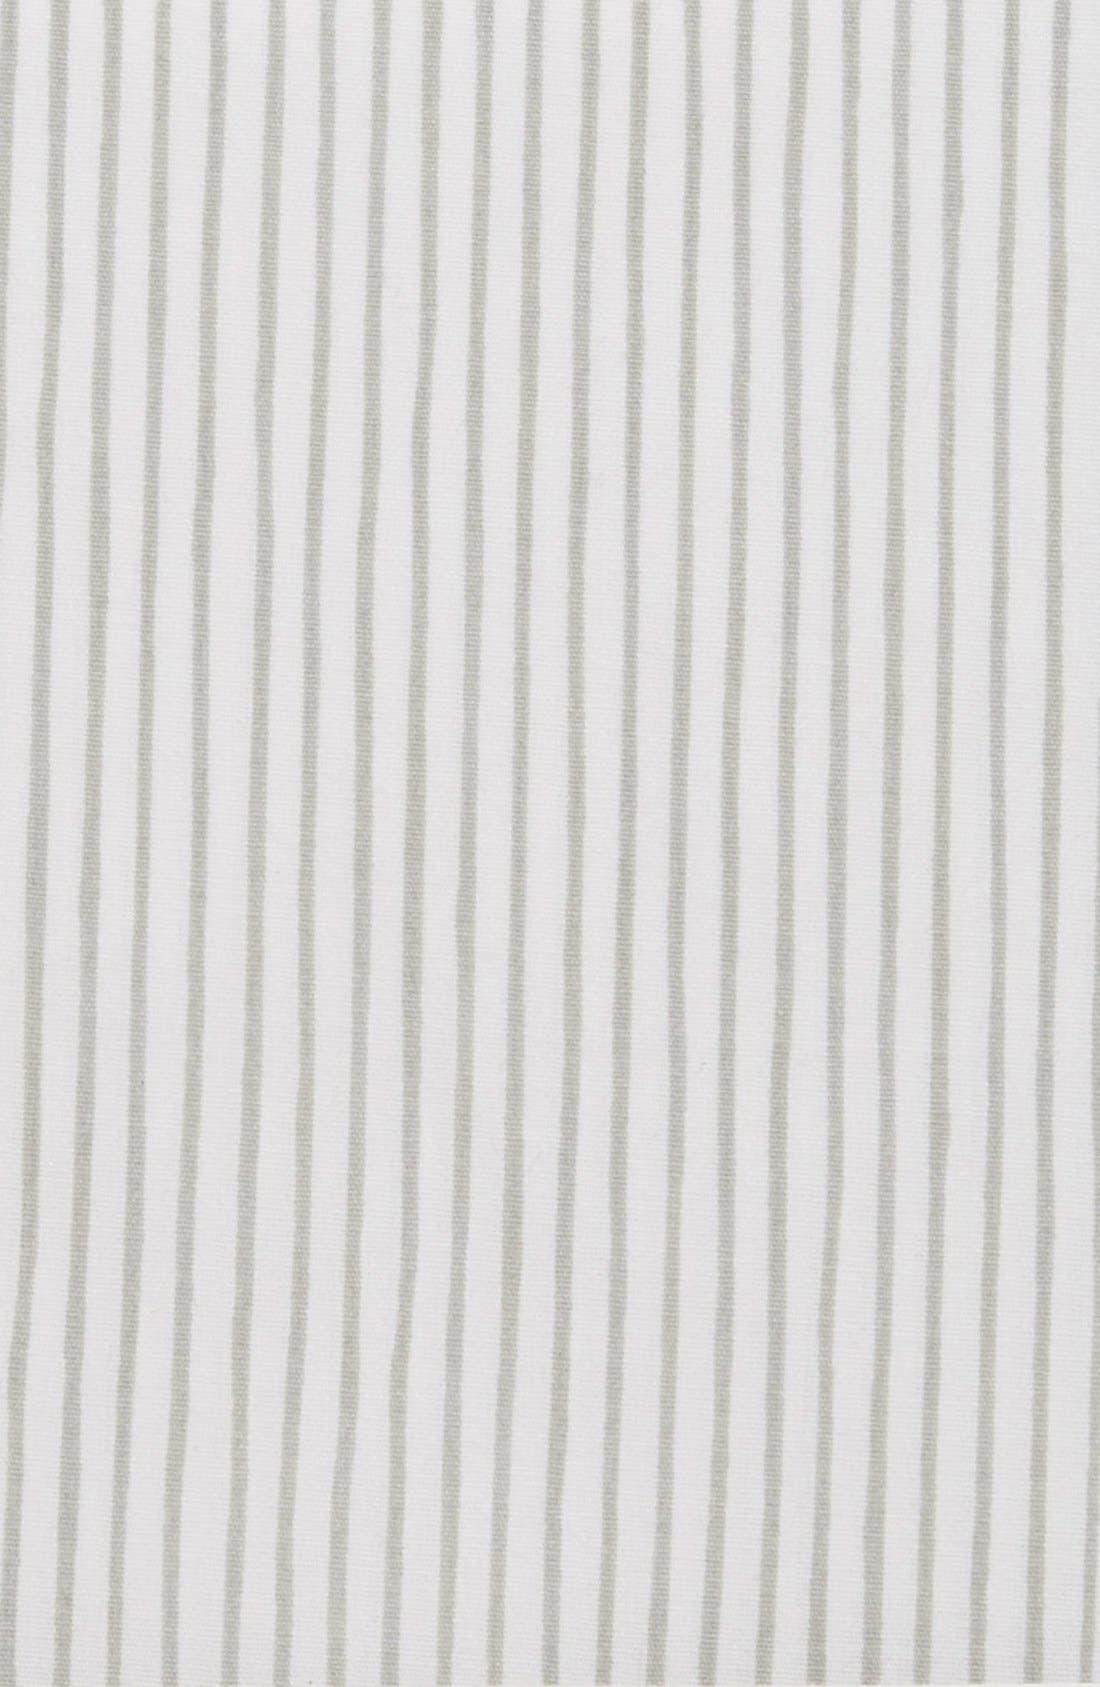 Pencil Stripe Crib Sheet,                             Alternate thumbnail 2, color,                             GREY